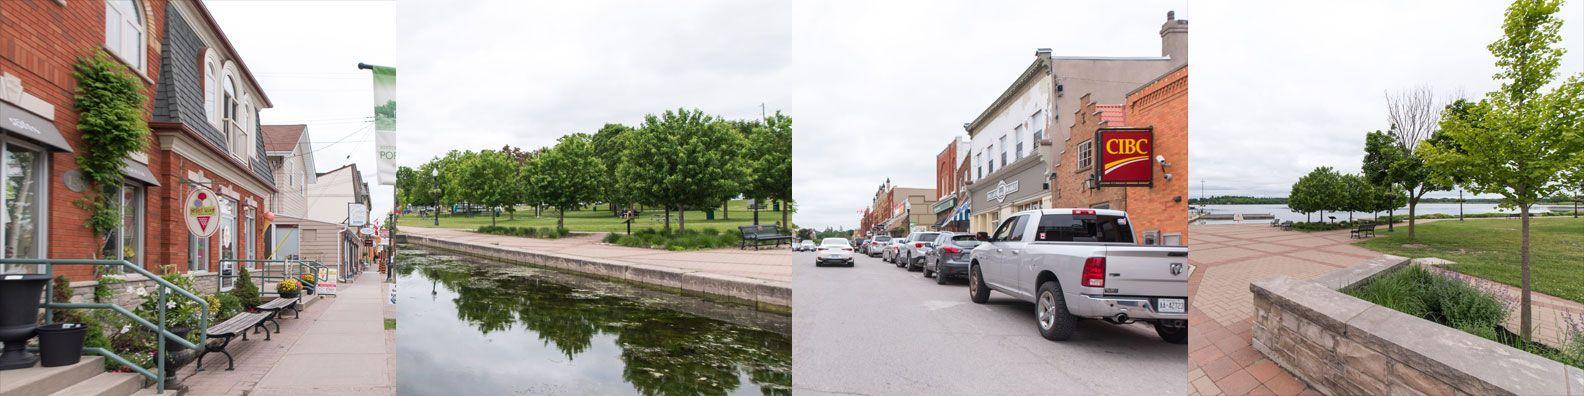 Scugog and Uxbridge Real Estate